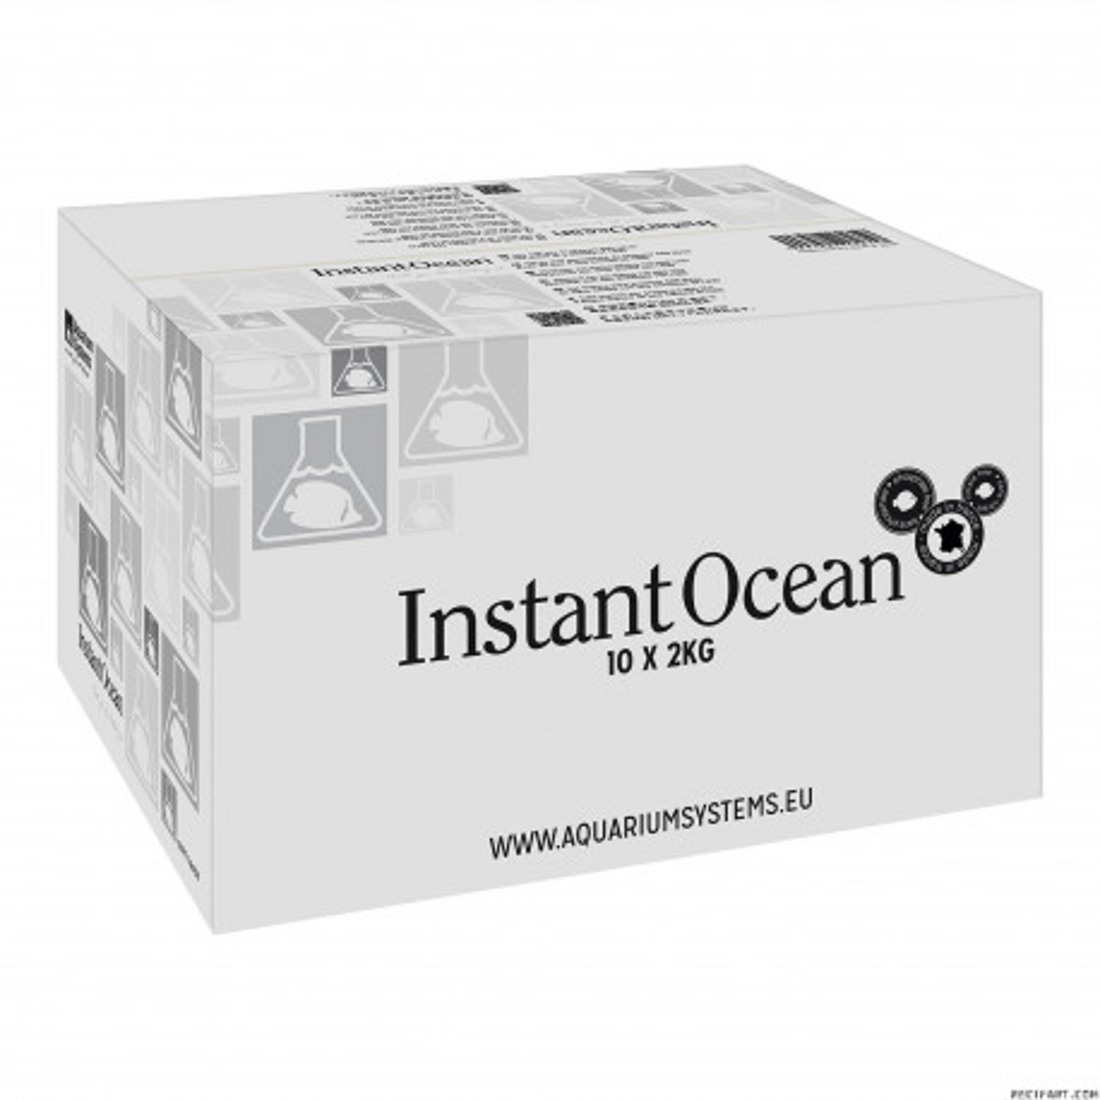 Aquarium systems Instant Ocean 20kg box (2kg doses)